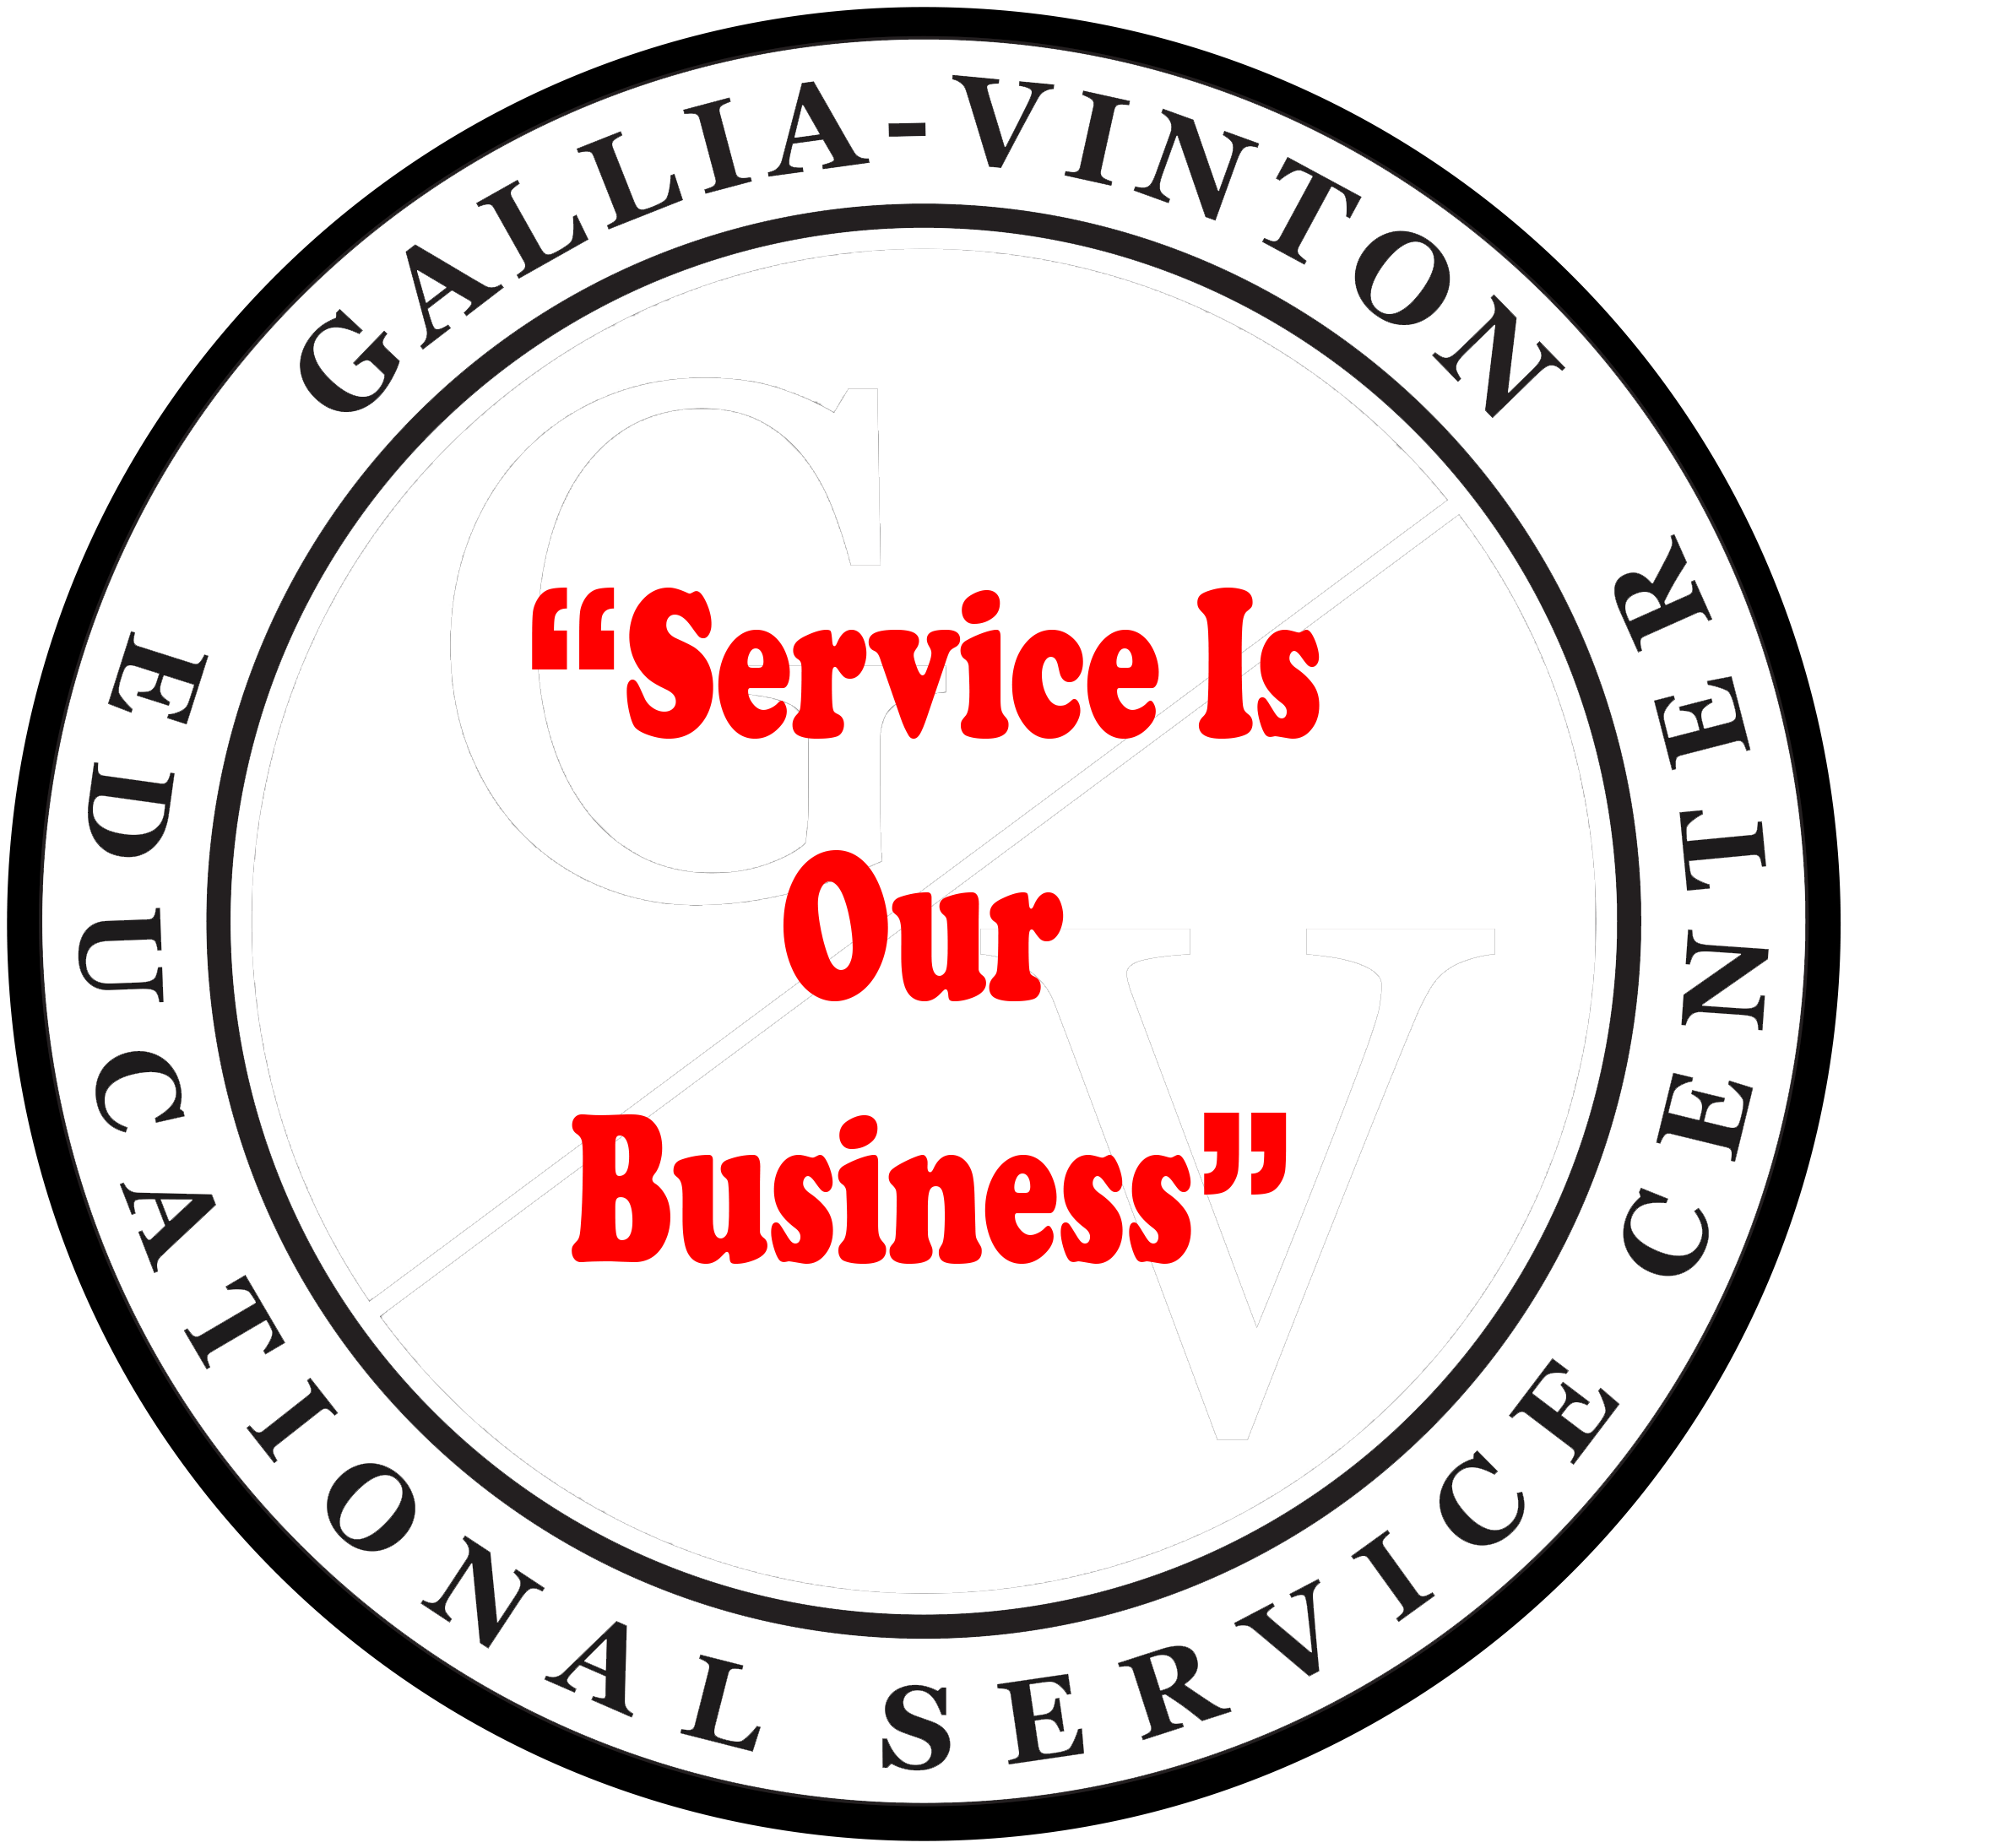 gallia vinton educational service center service is our business